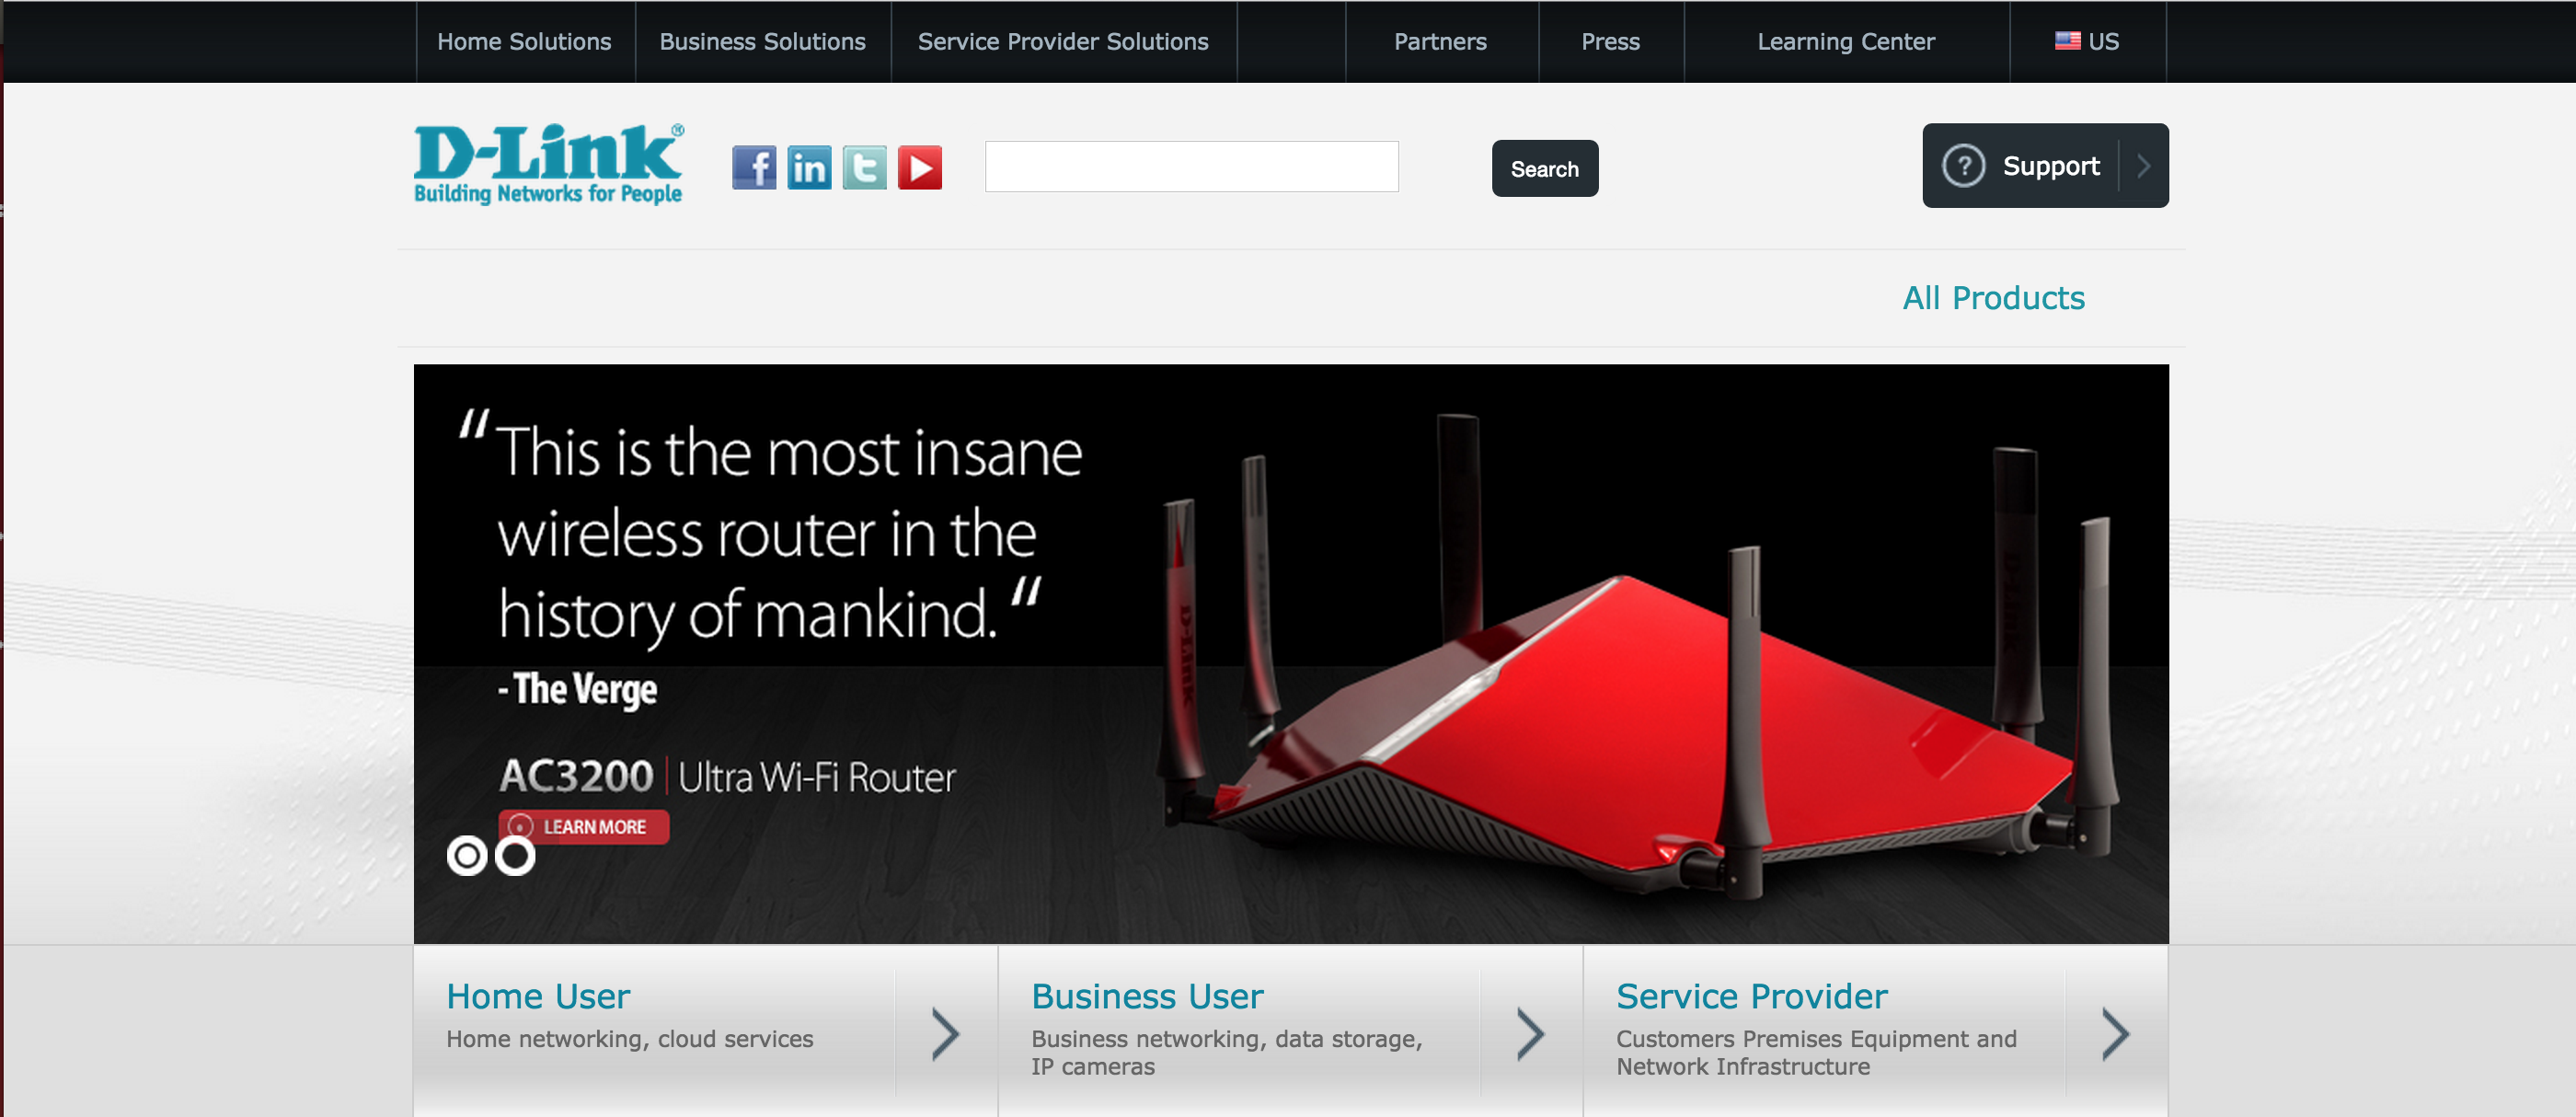 Insane router